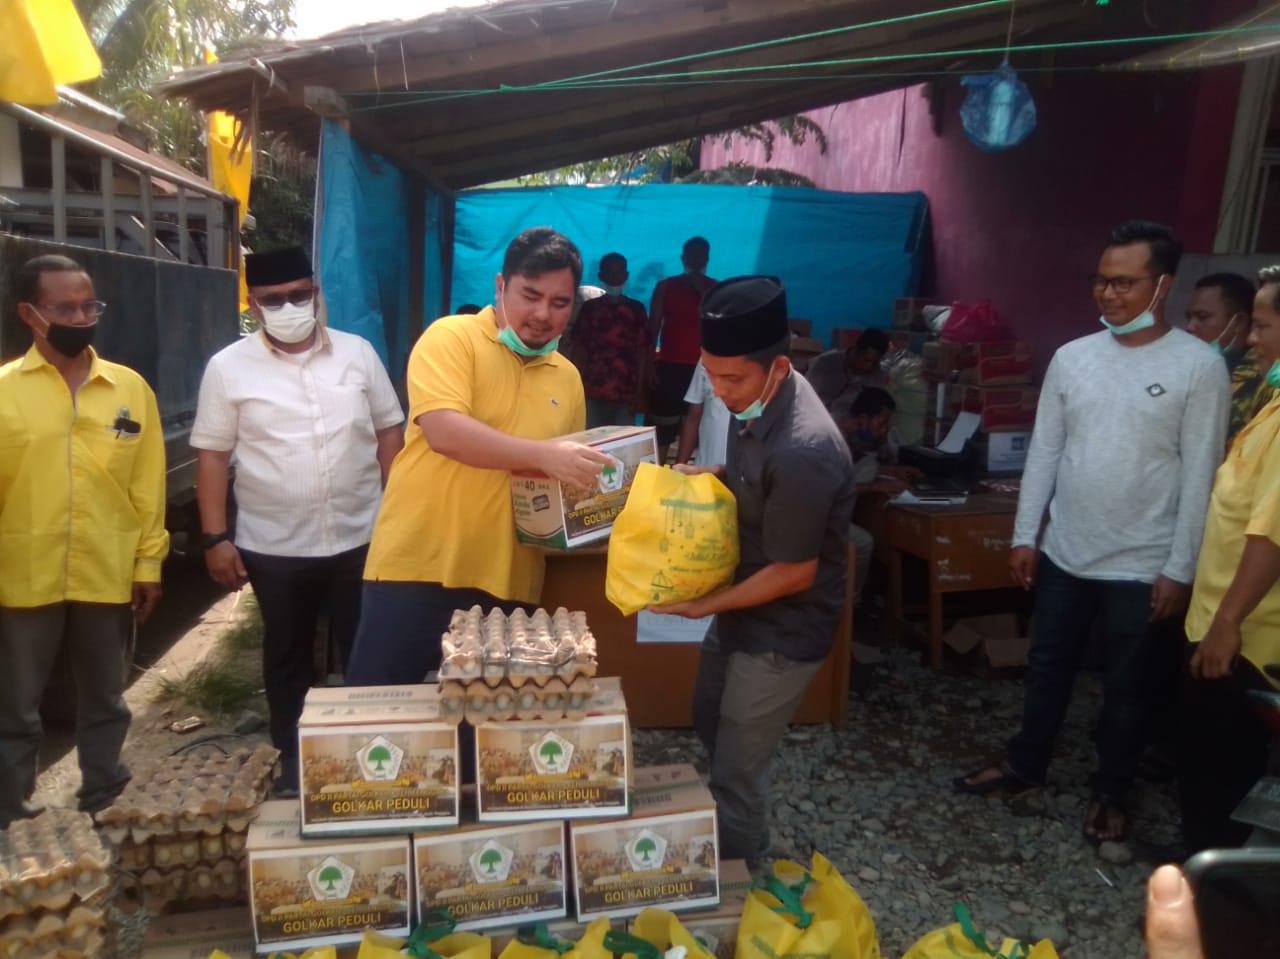 Golkar Aceh Tenggara Serahkan Sembako Untuk Korban Kebakaran di Desa Penampaan